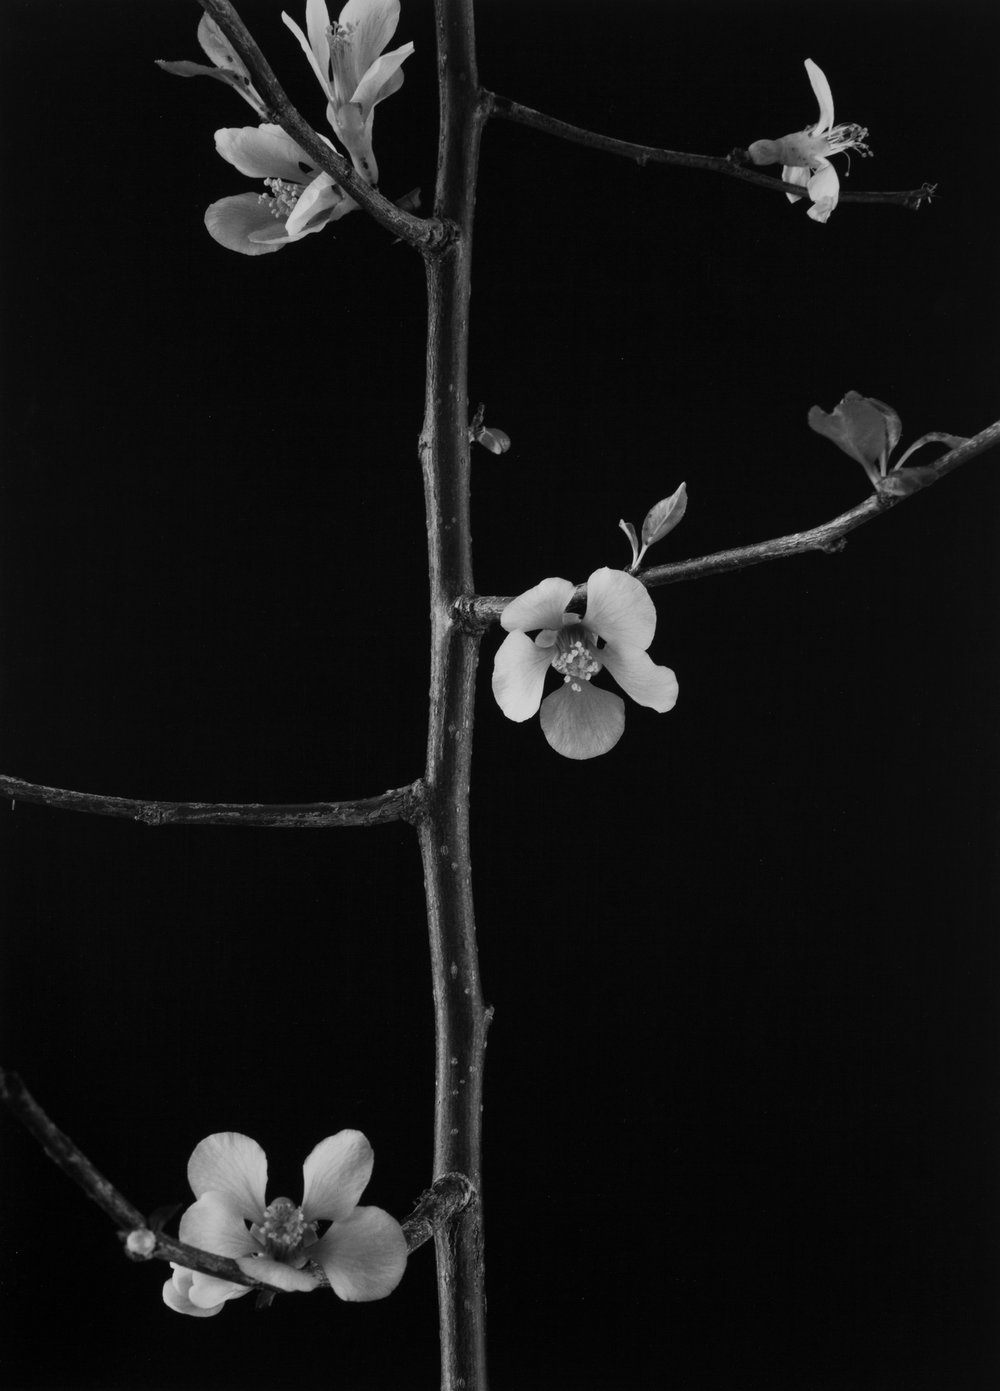 Pear Branch, Phoenix, AZ, 2012.jpg